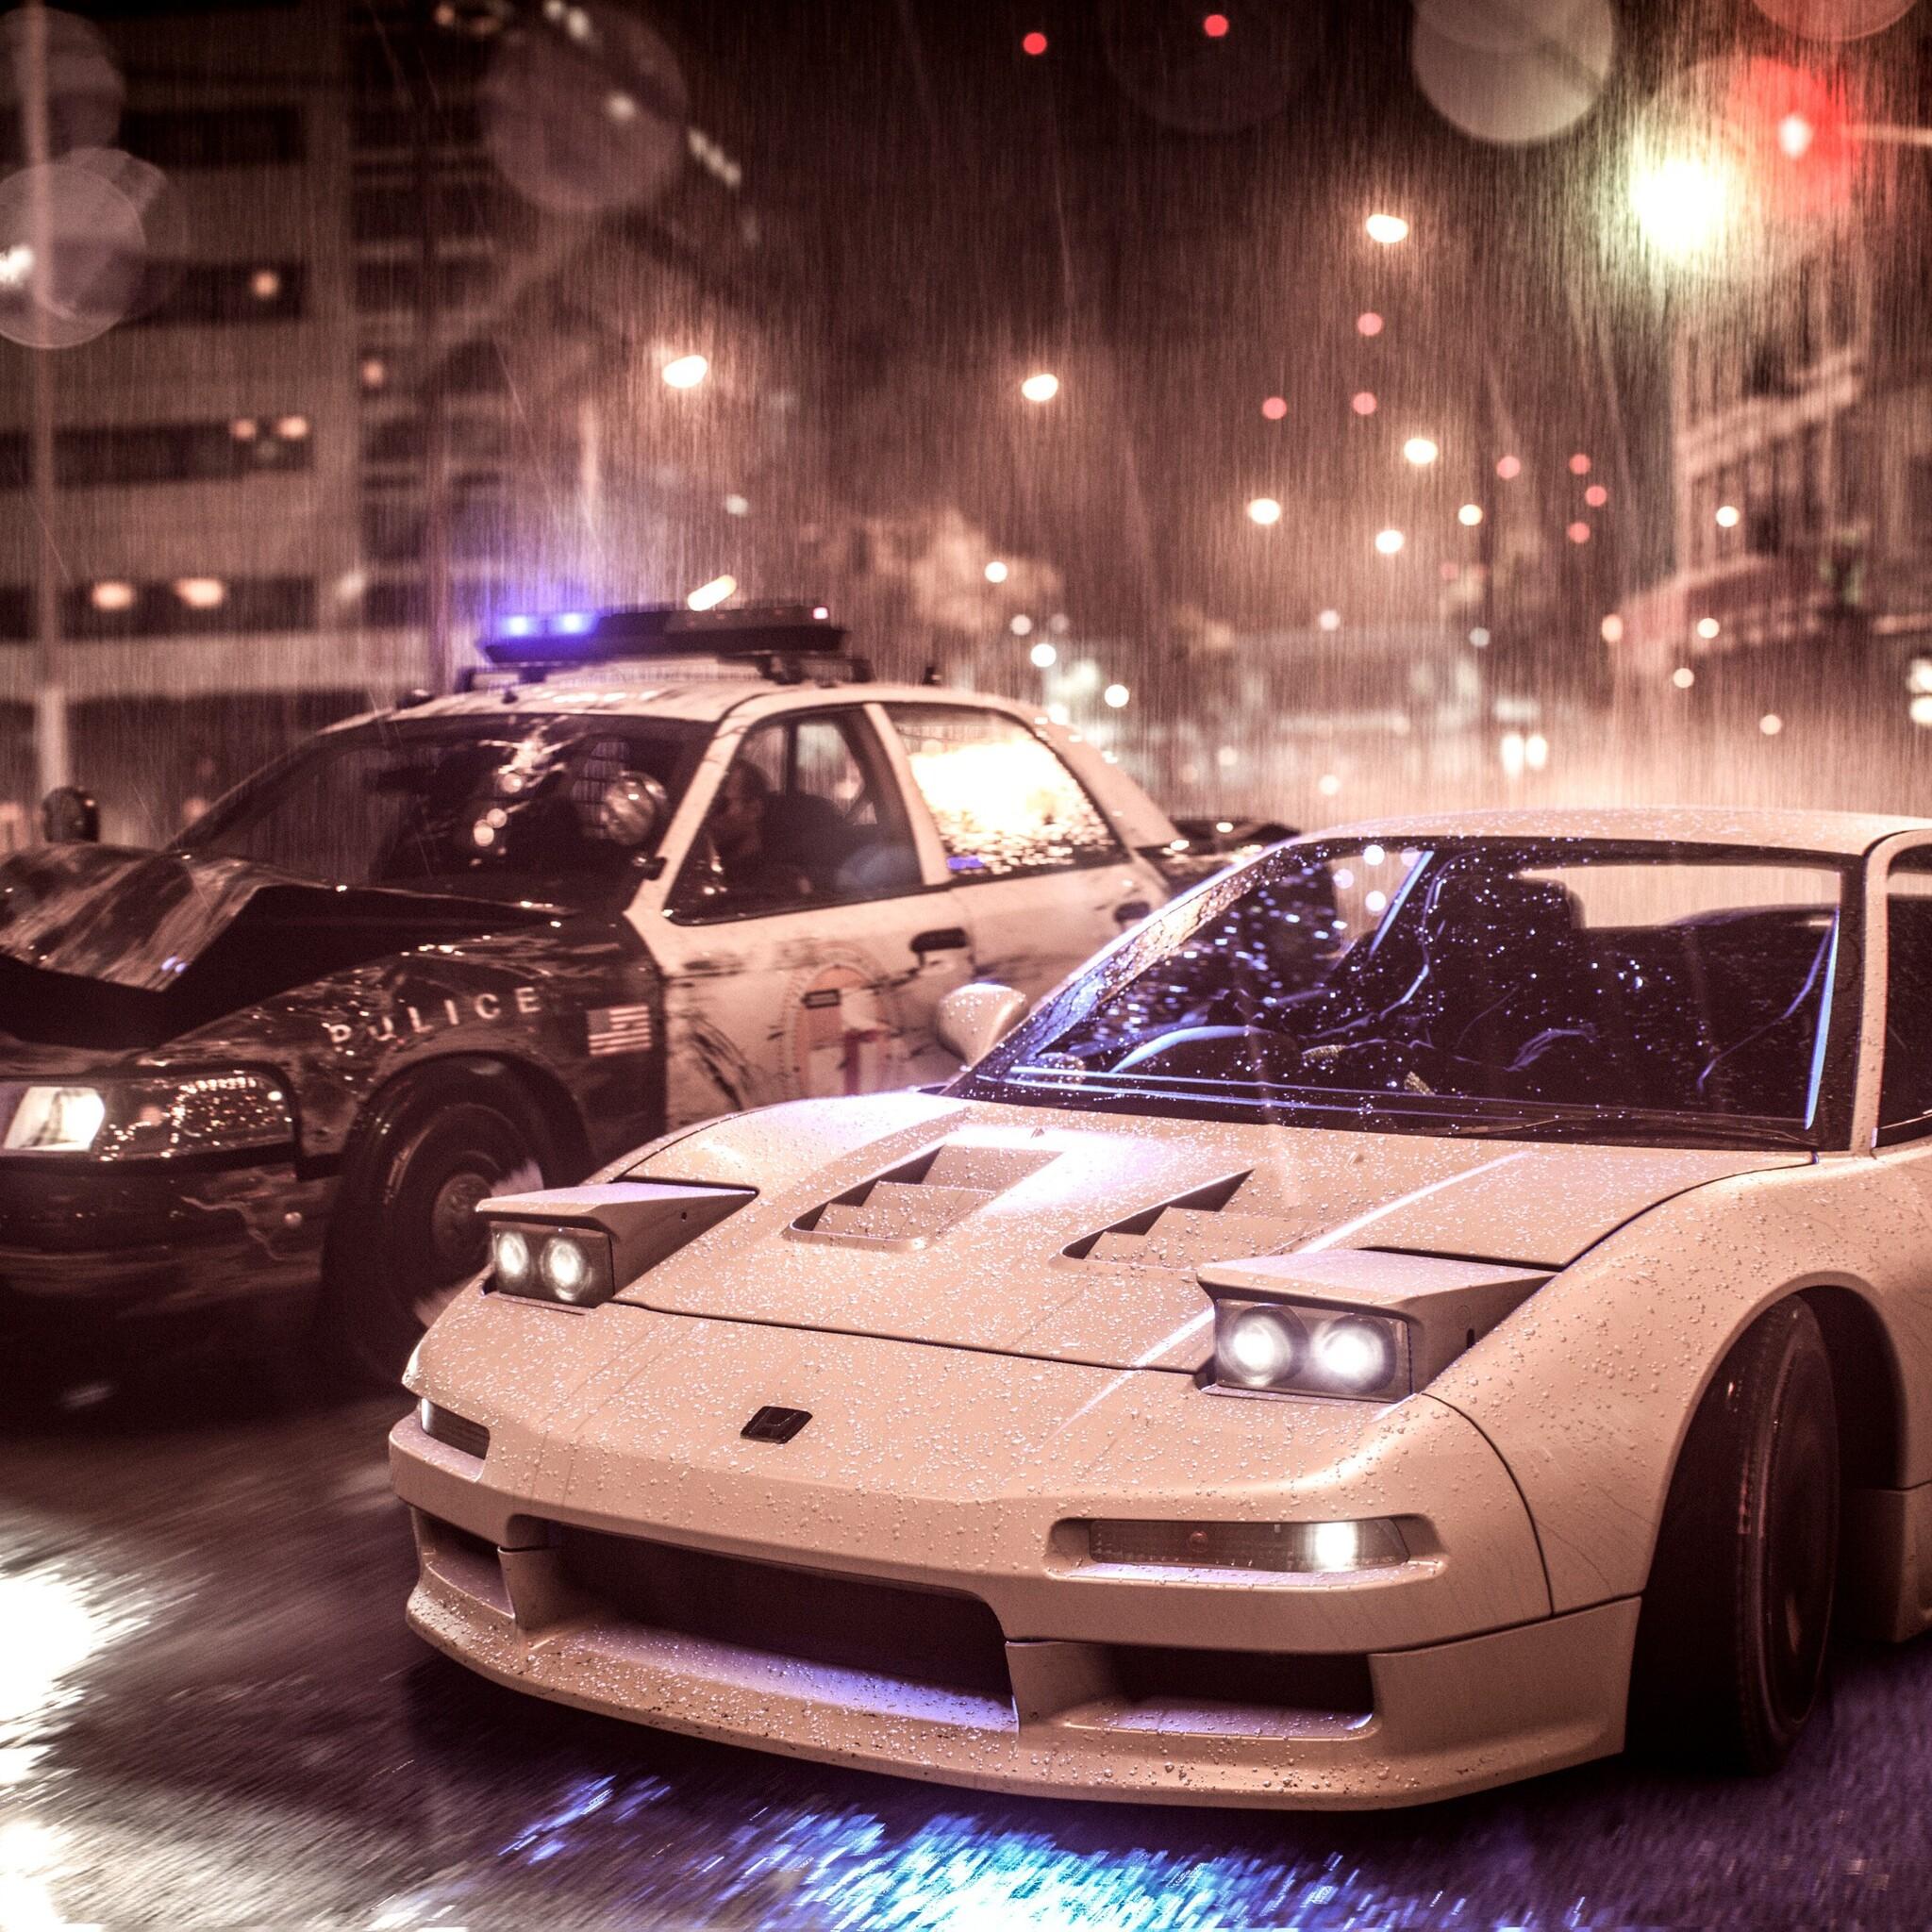 2048x2048 Need For Speed Acura Nsx Vs Police Car 4k Ipad Air Hd 4k